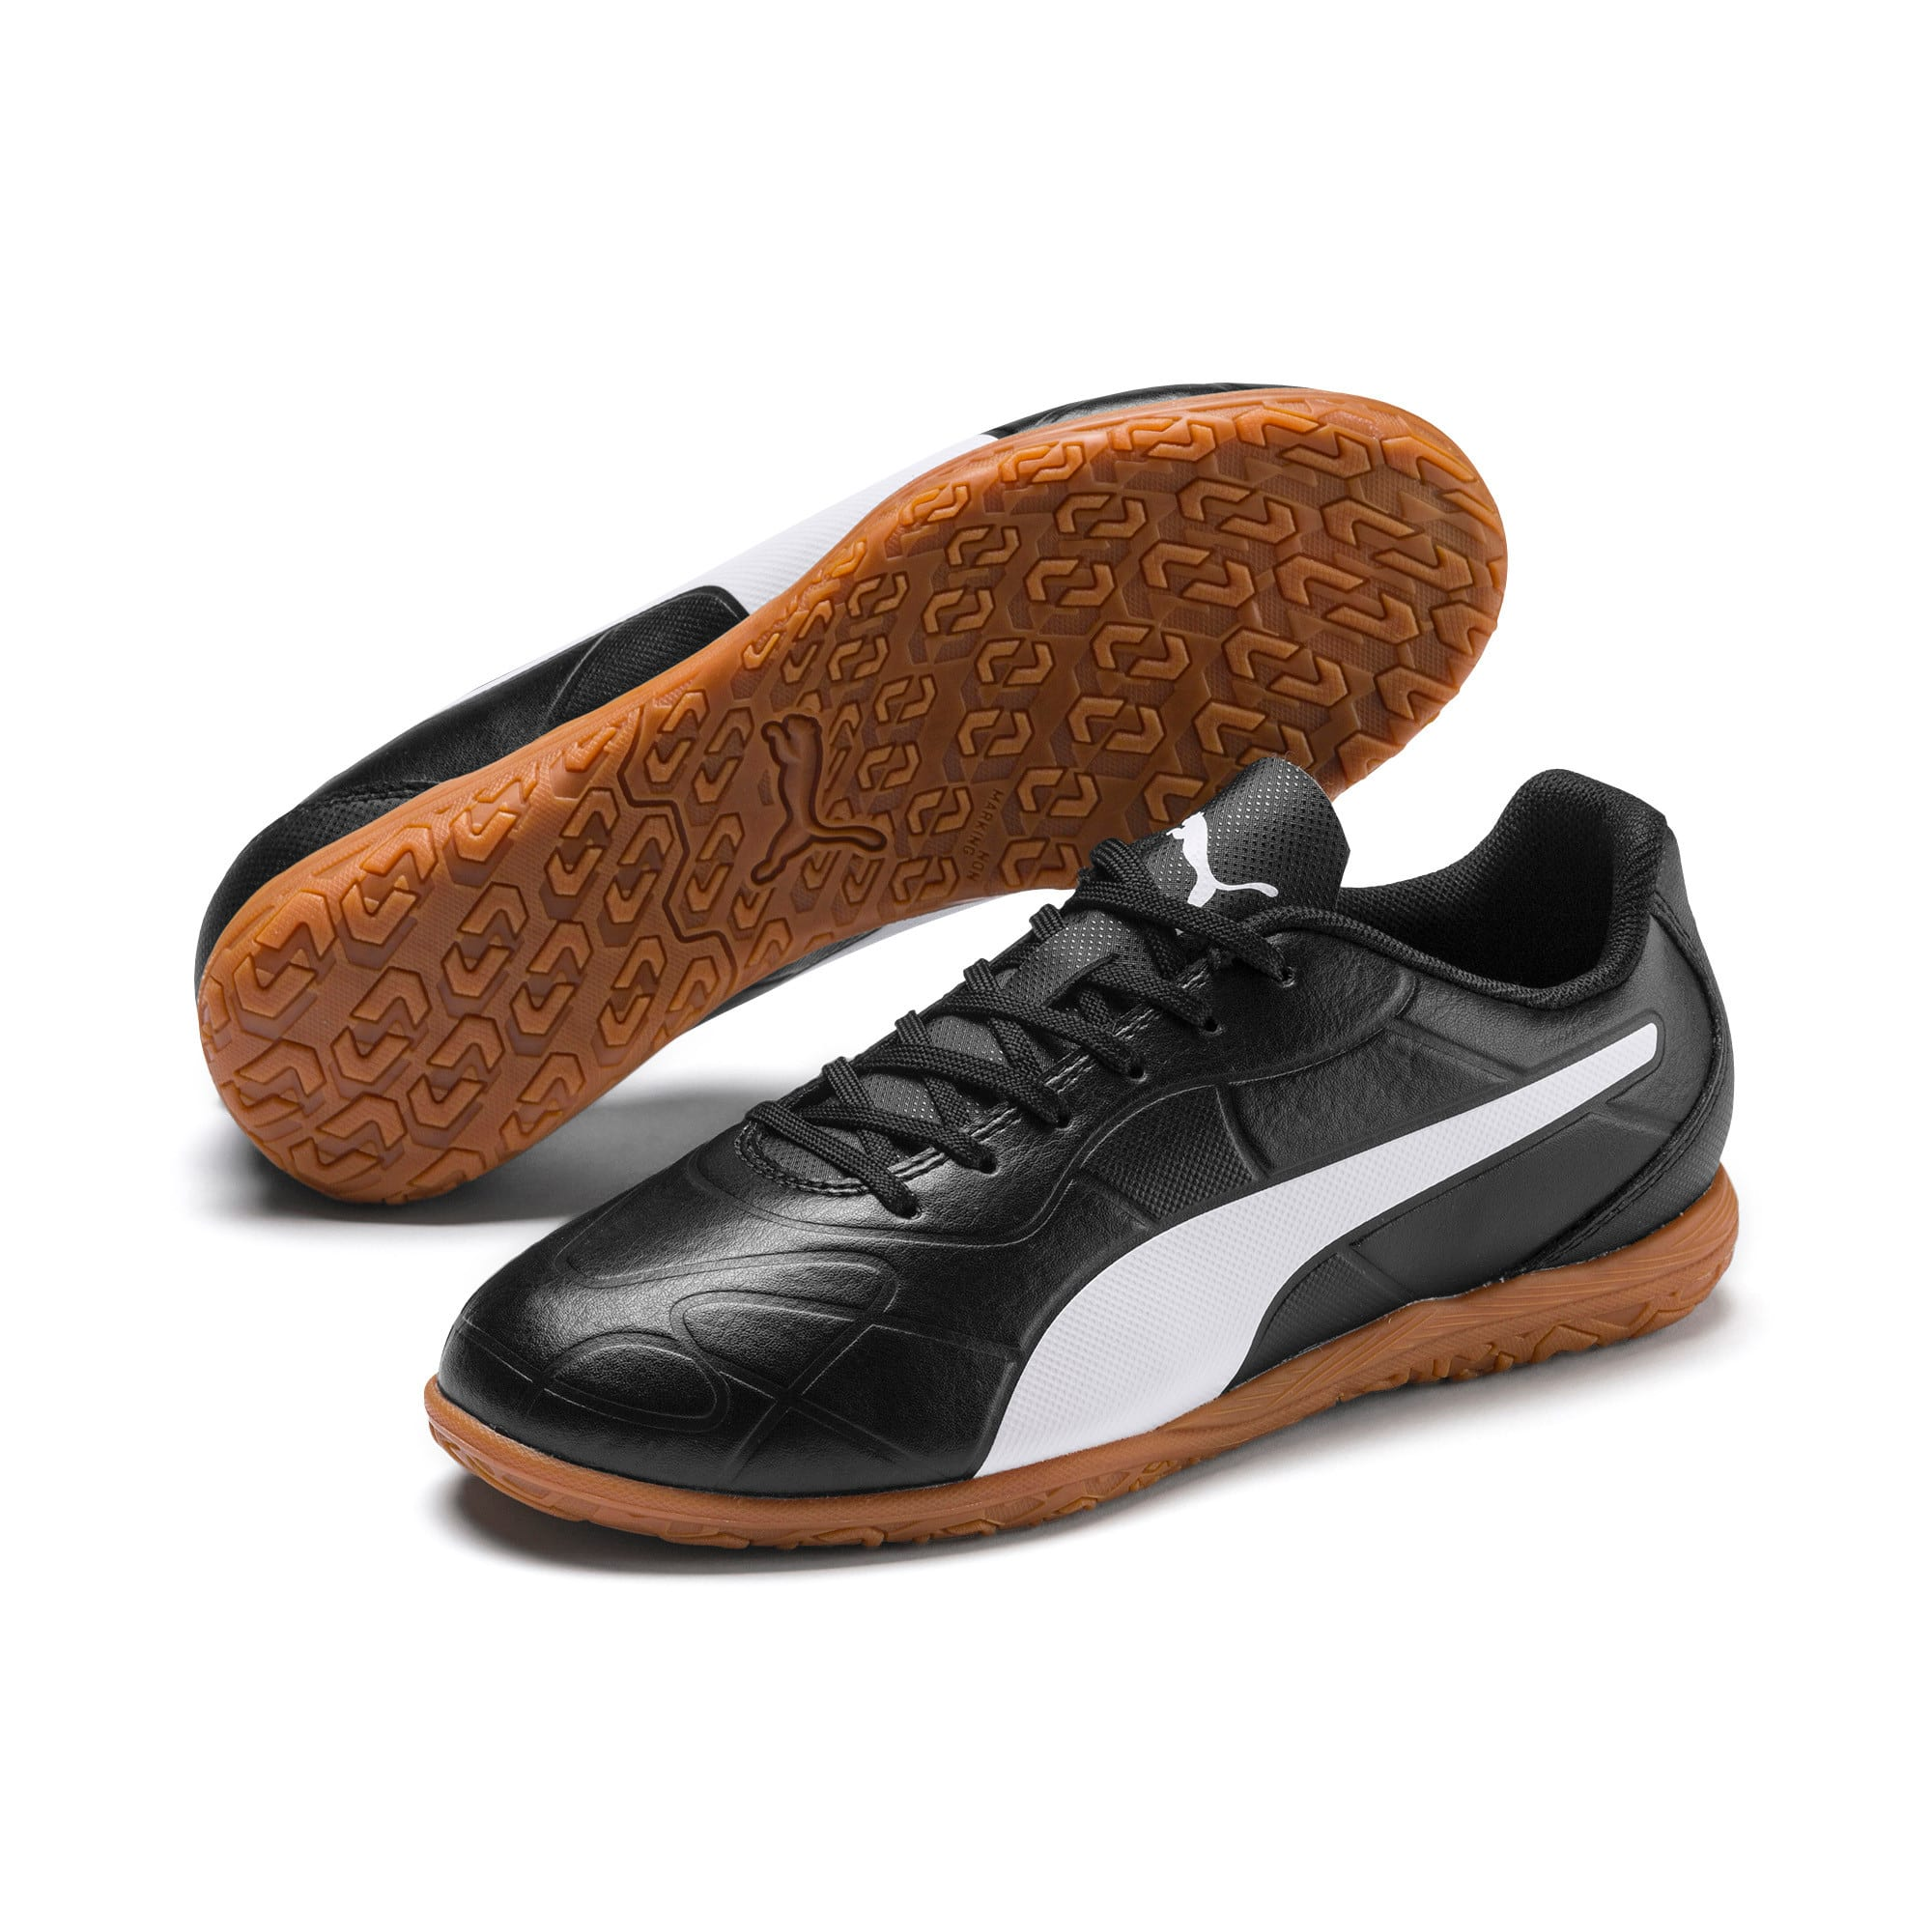 Thumbnail 2 of Monarch IT Youth Football Boot, Puma Black-Puma White, medium